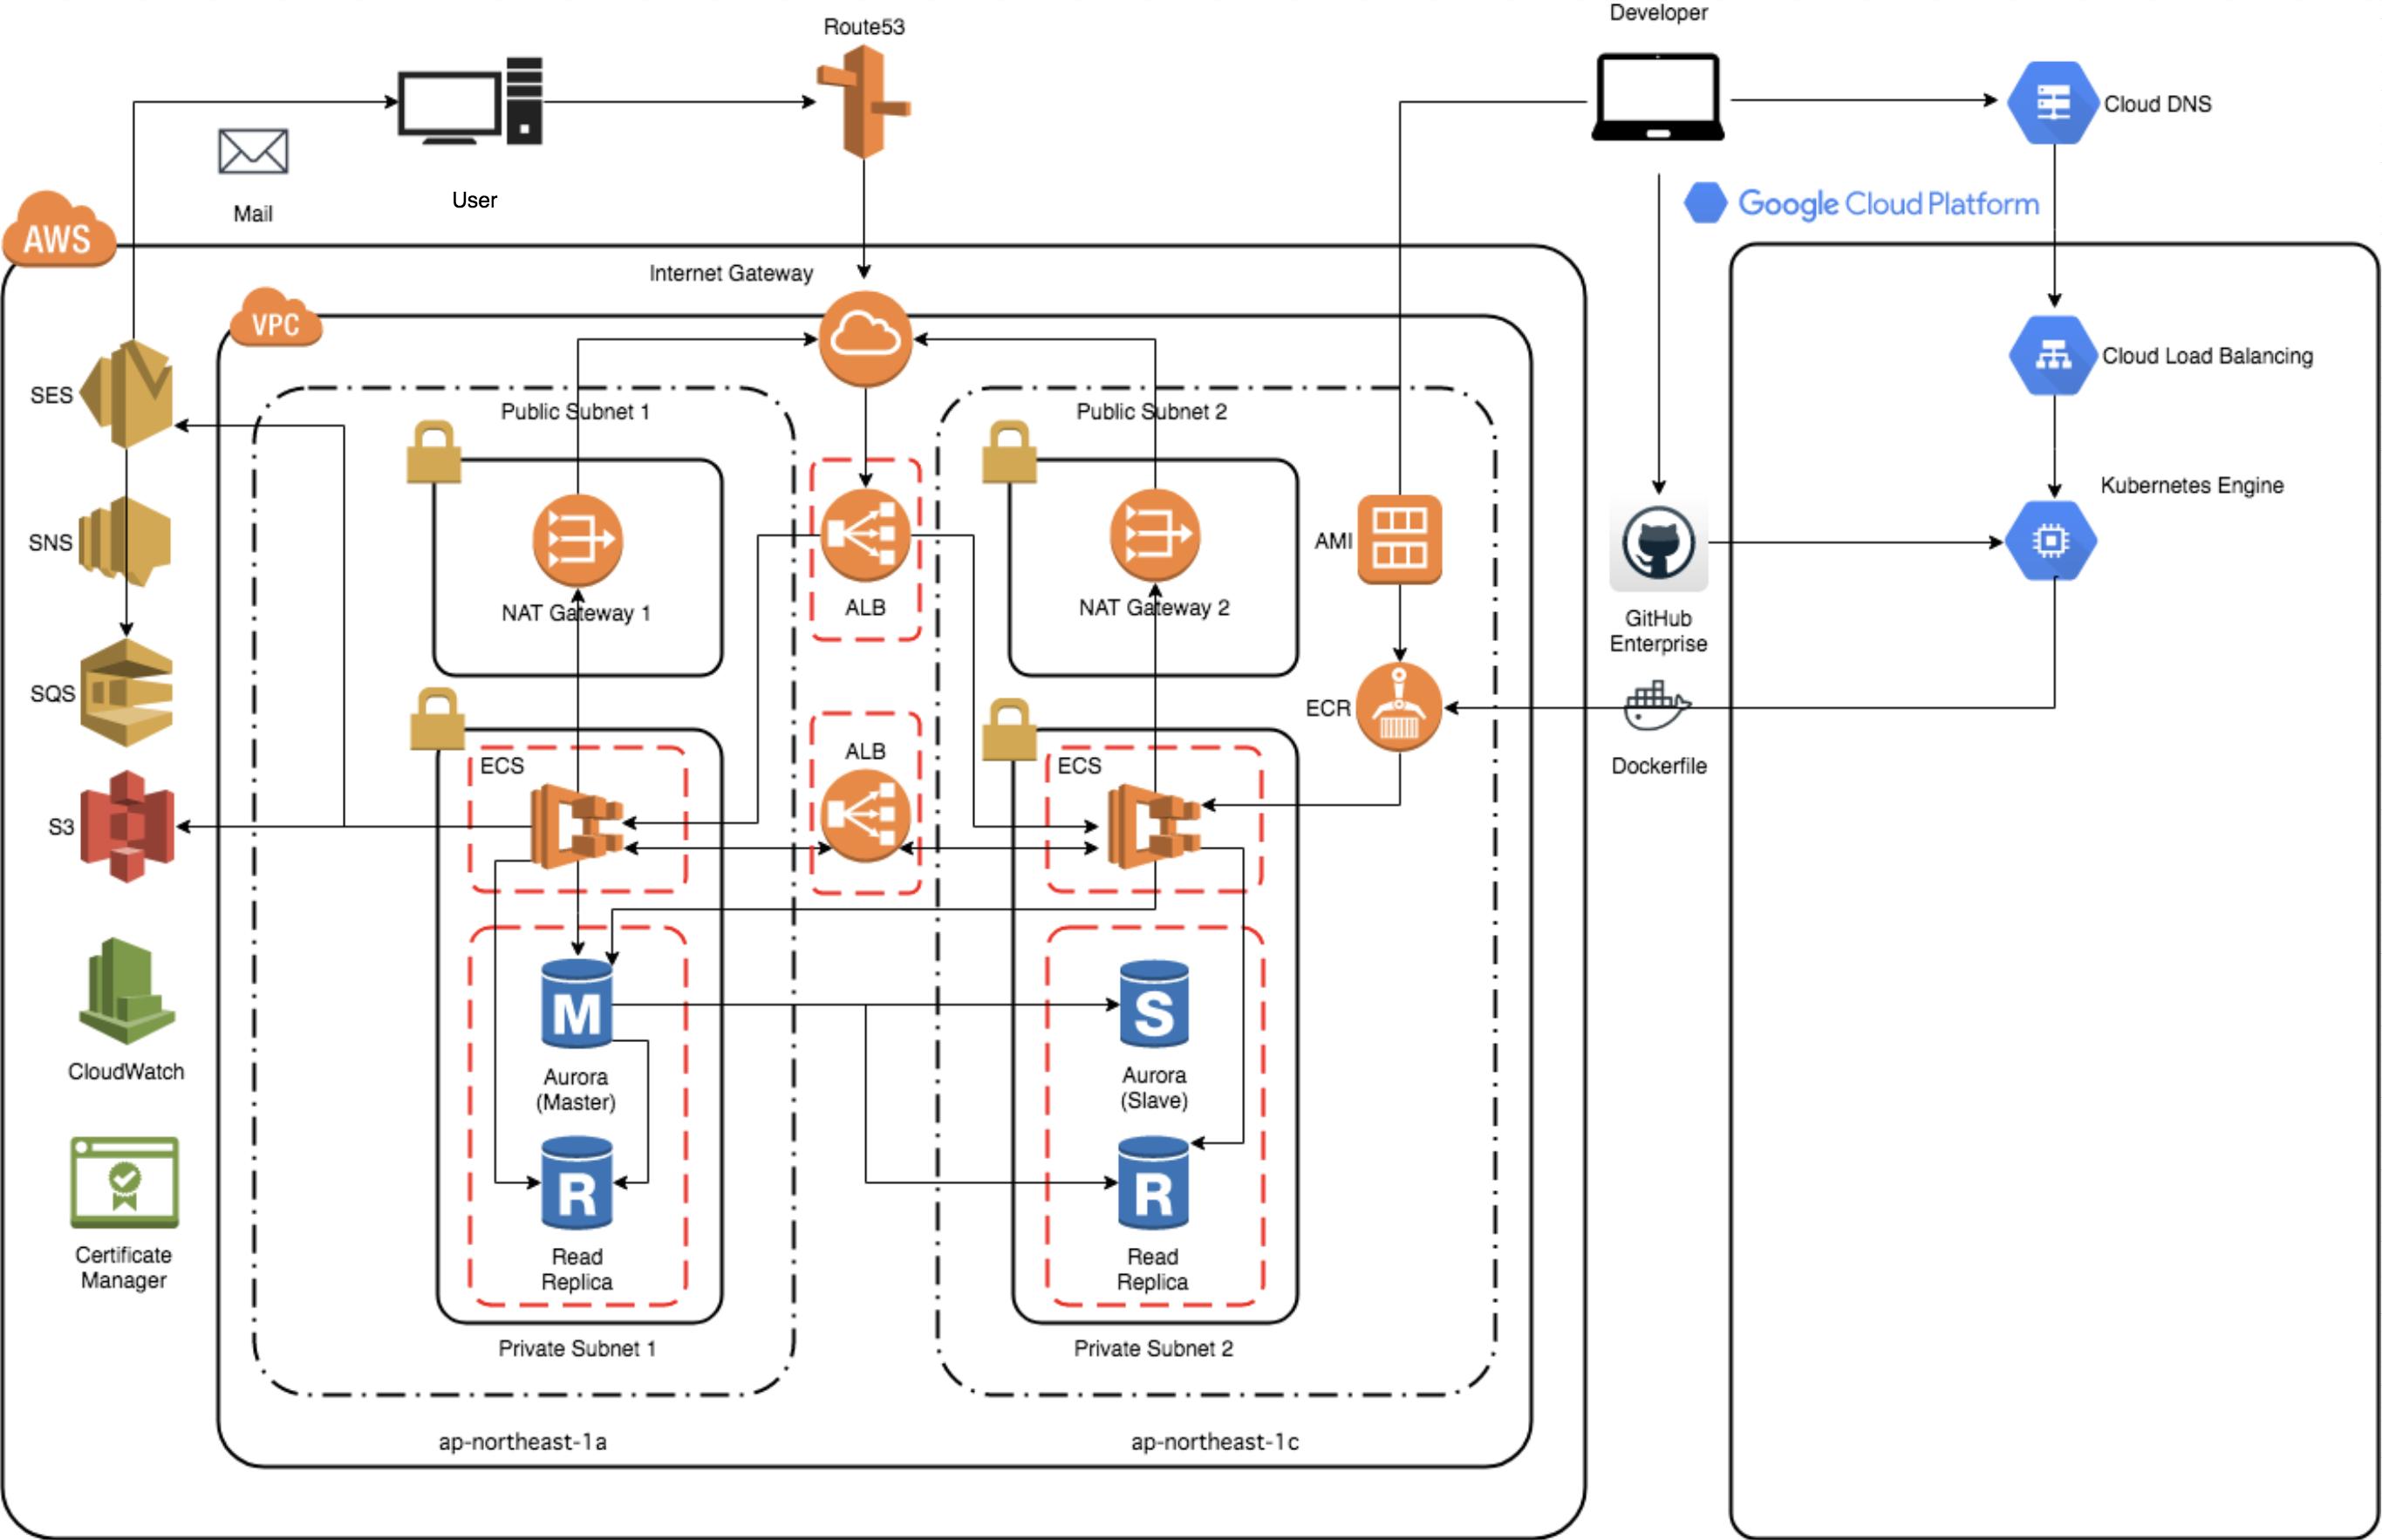 Infrastructure as Codeによるインフラ運用:AWSアカウント分離とリソースのコード化